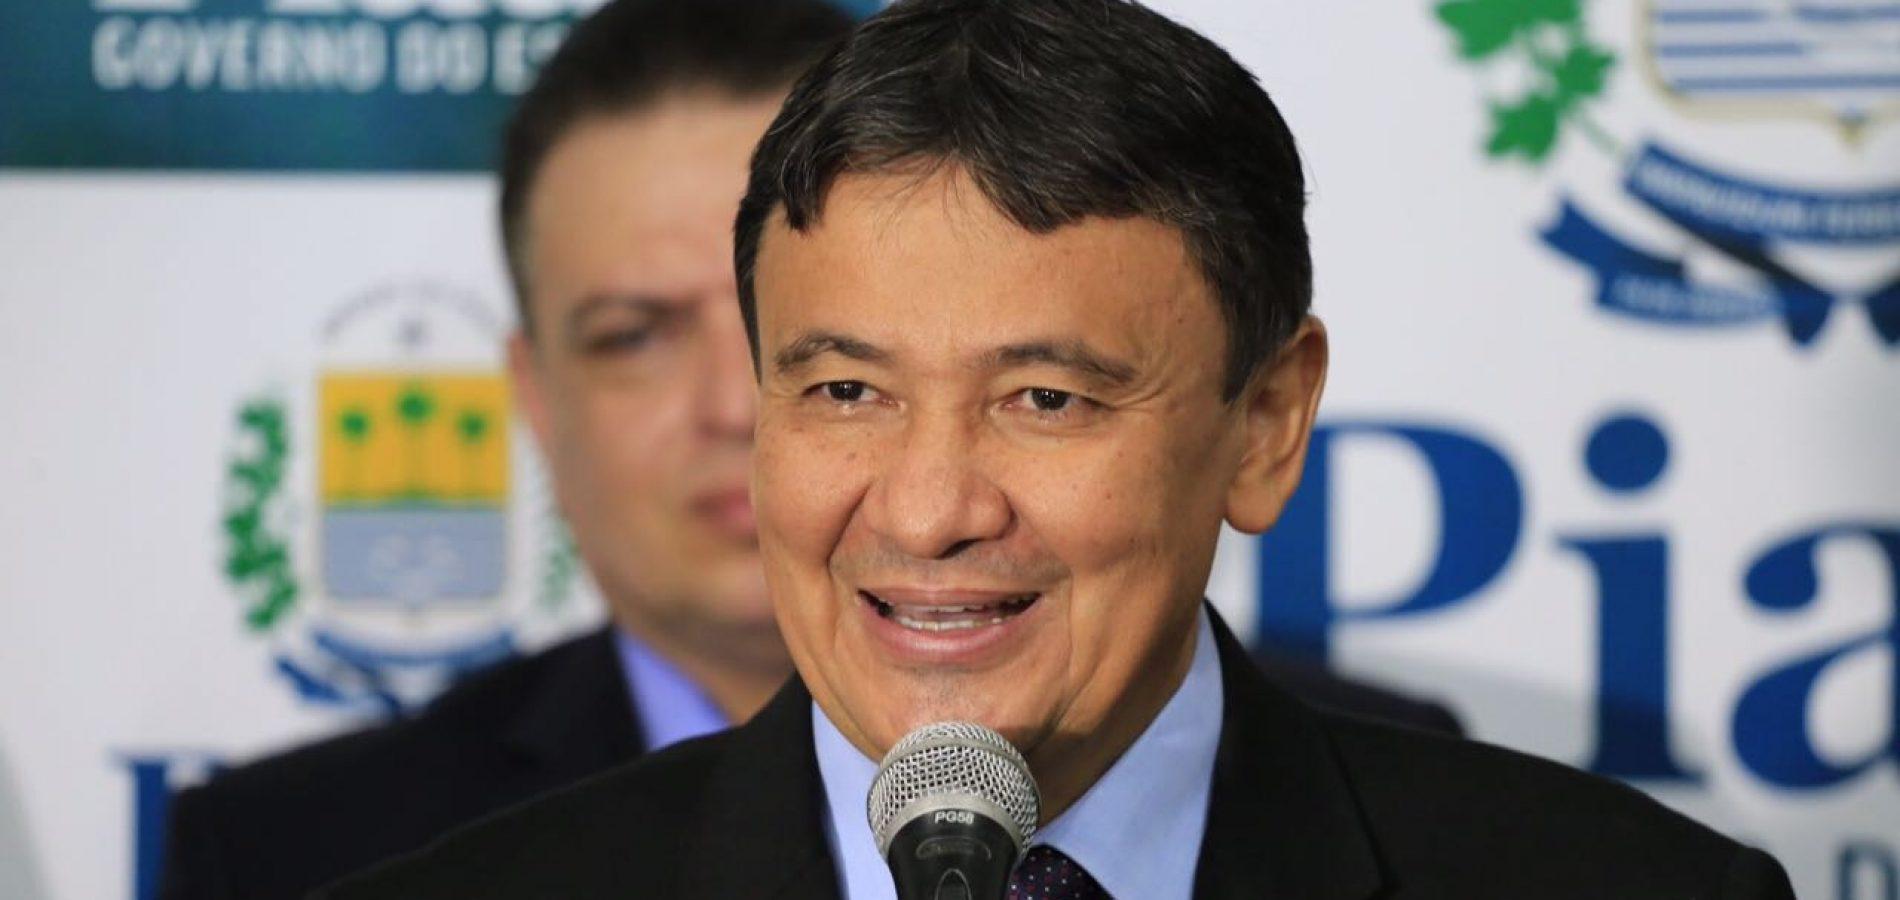 Governo realiza intercâmbio para atrair investidores do Ceará